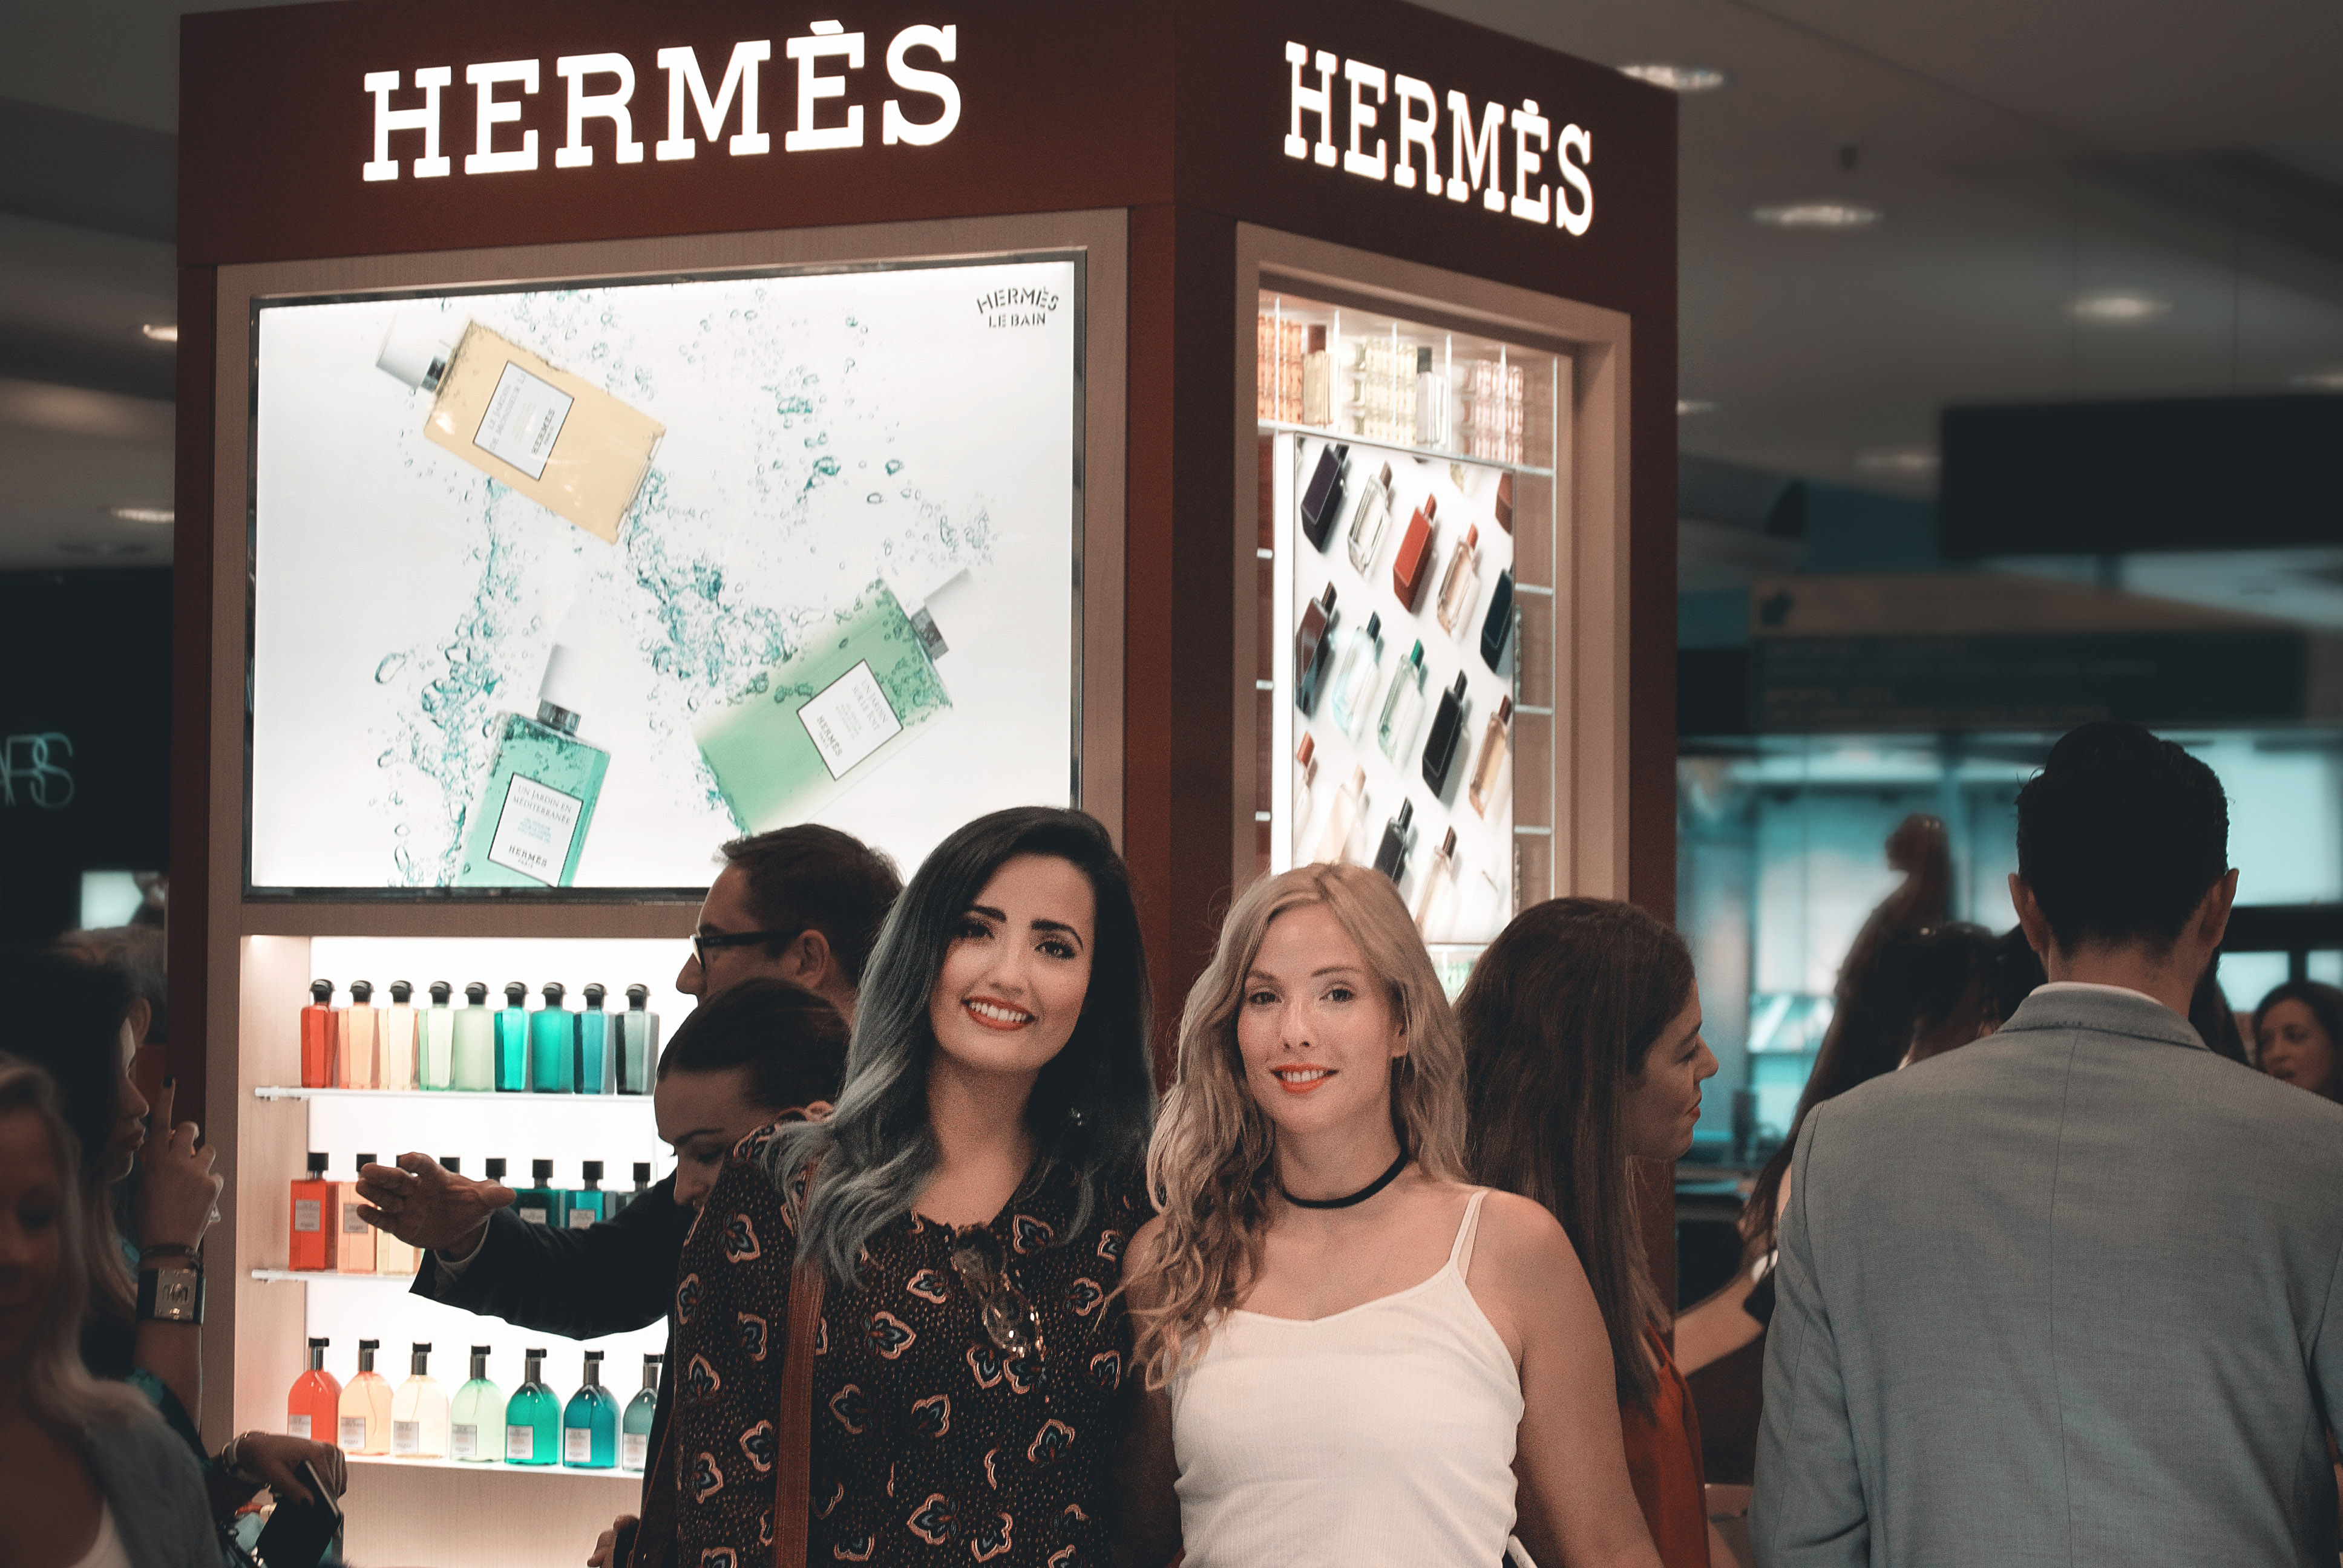 ¿A qué huele Hermes?